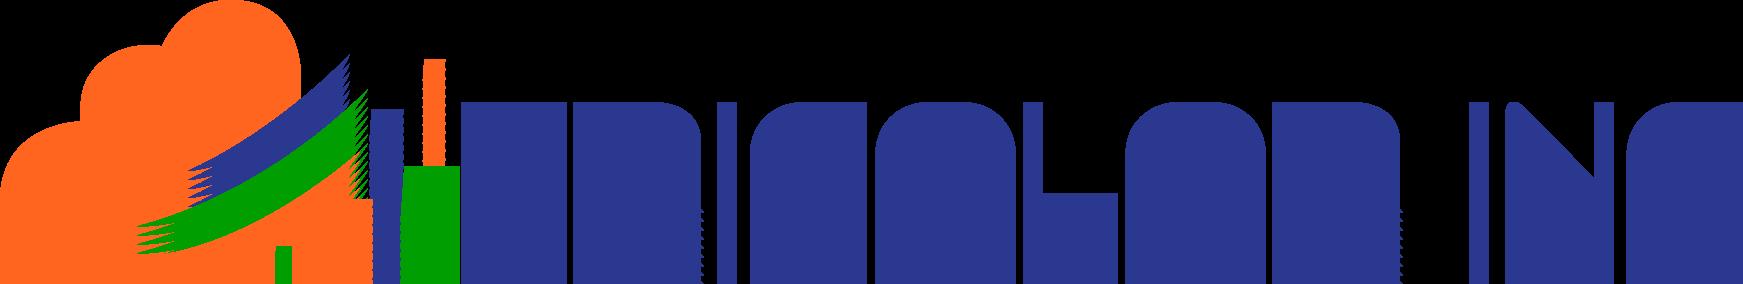 Tricolor Inc